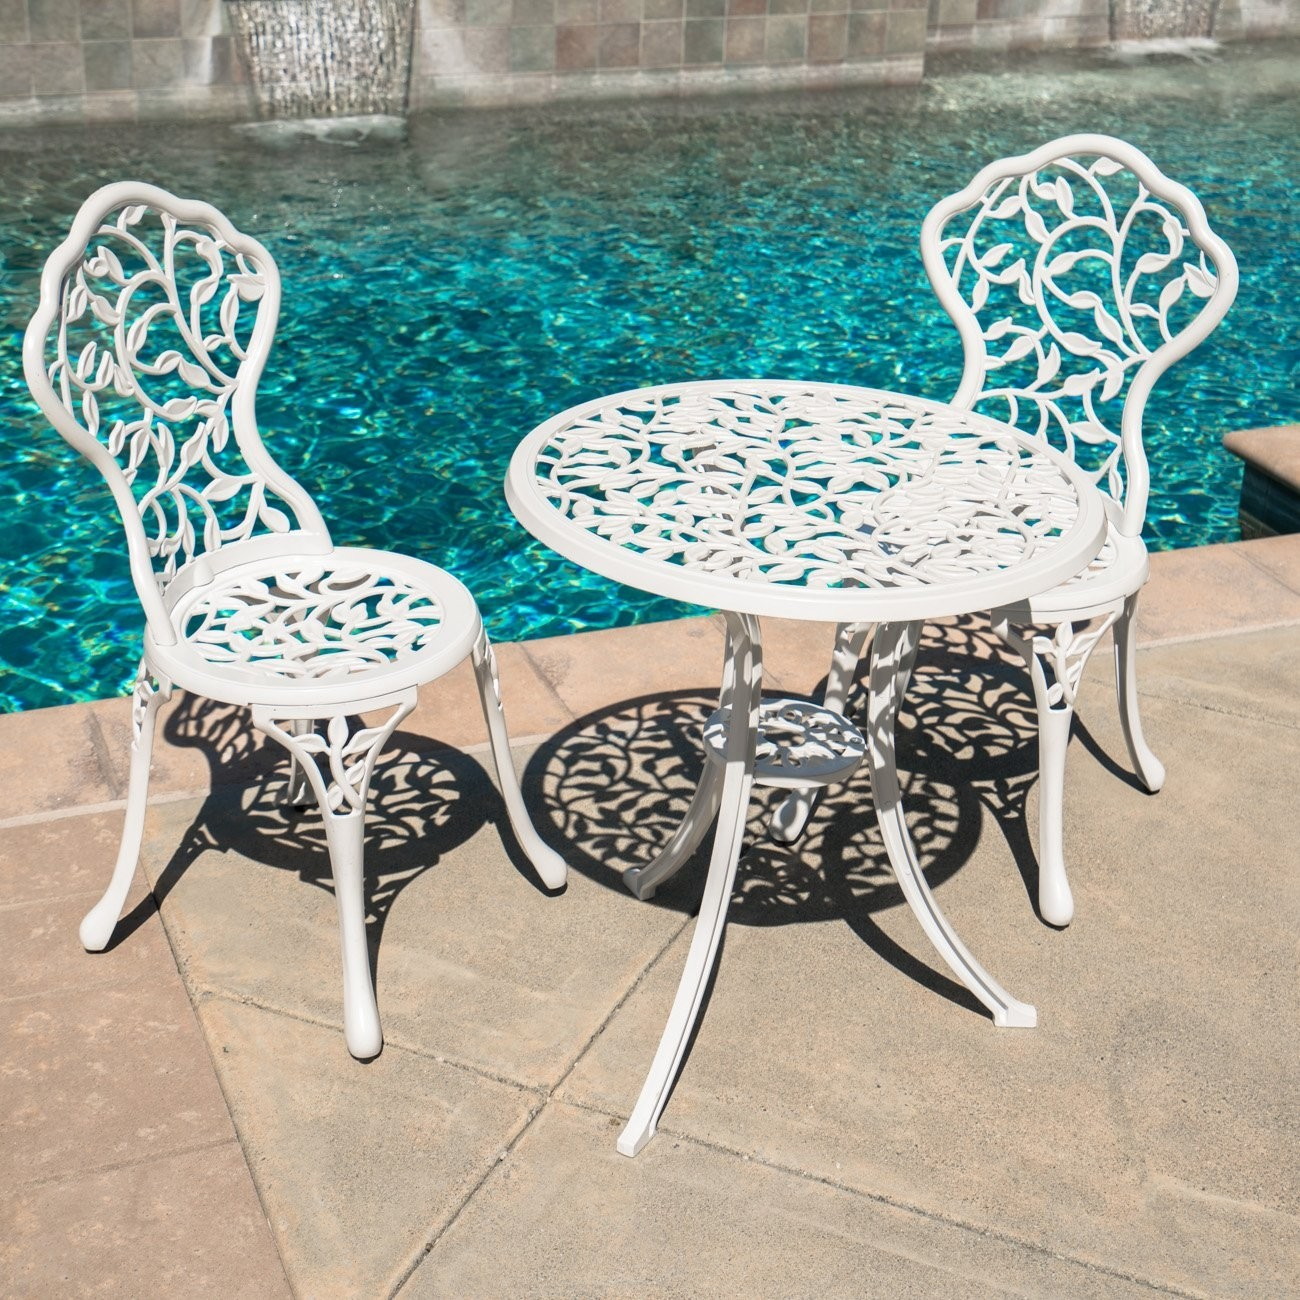 cast iron patio furniture sets ideas